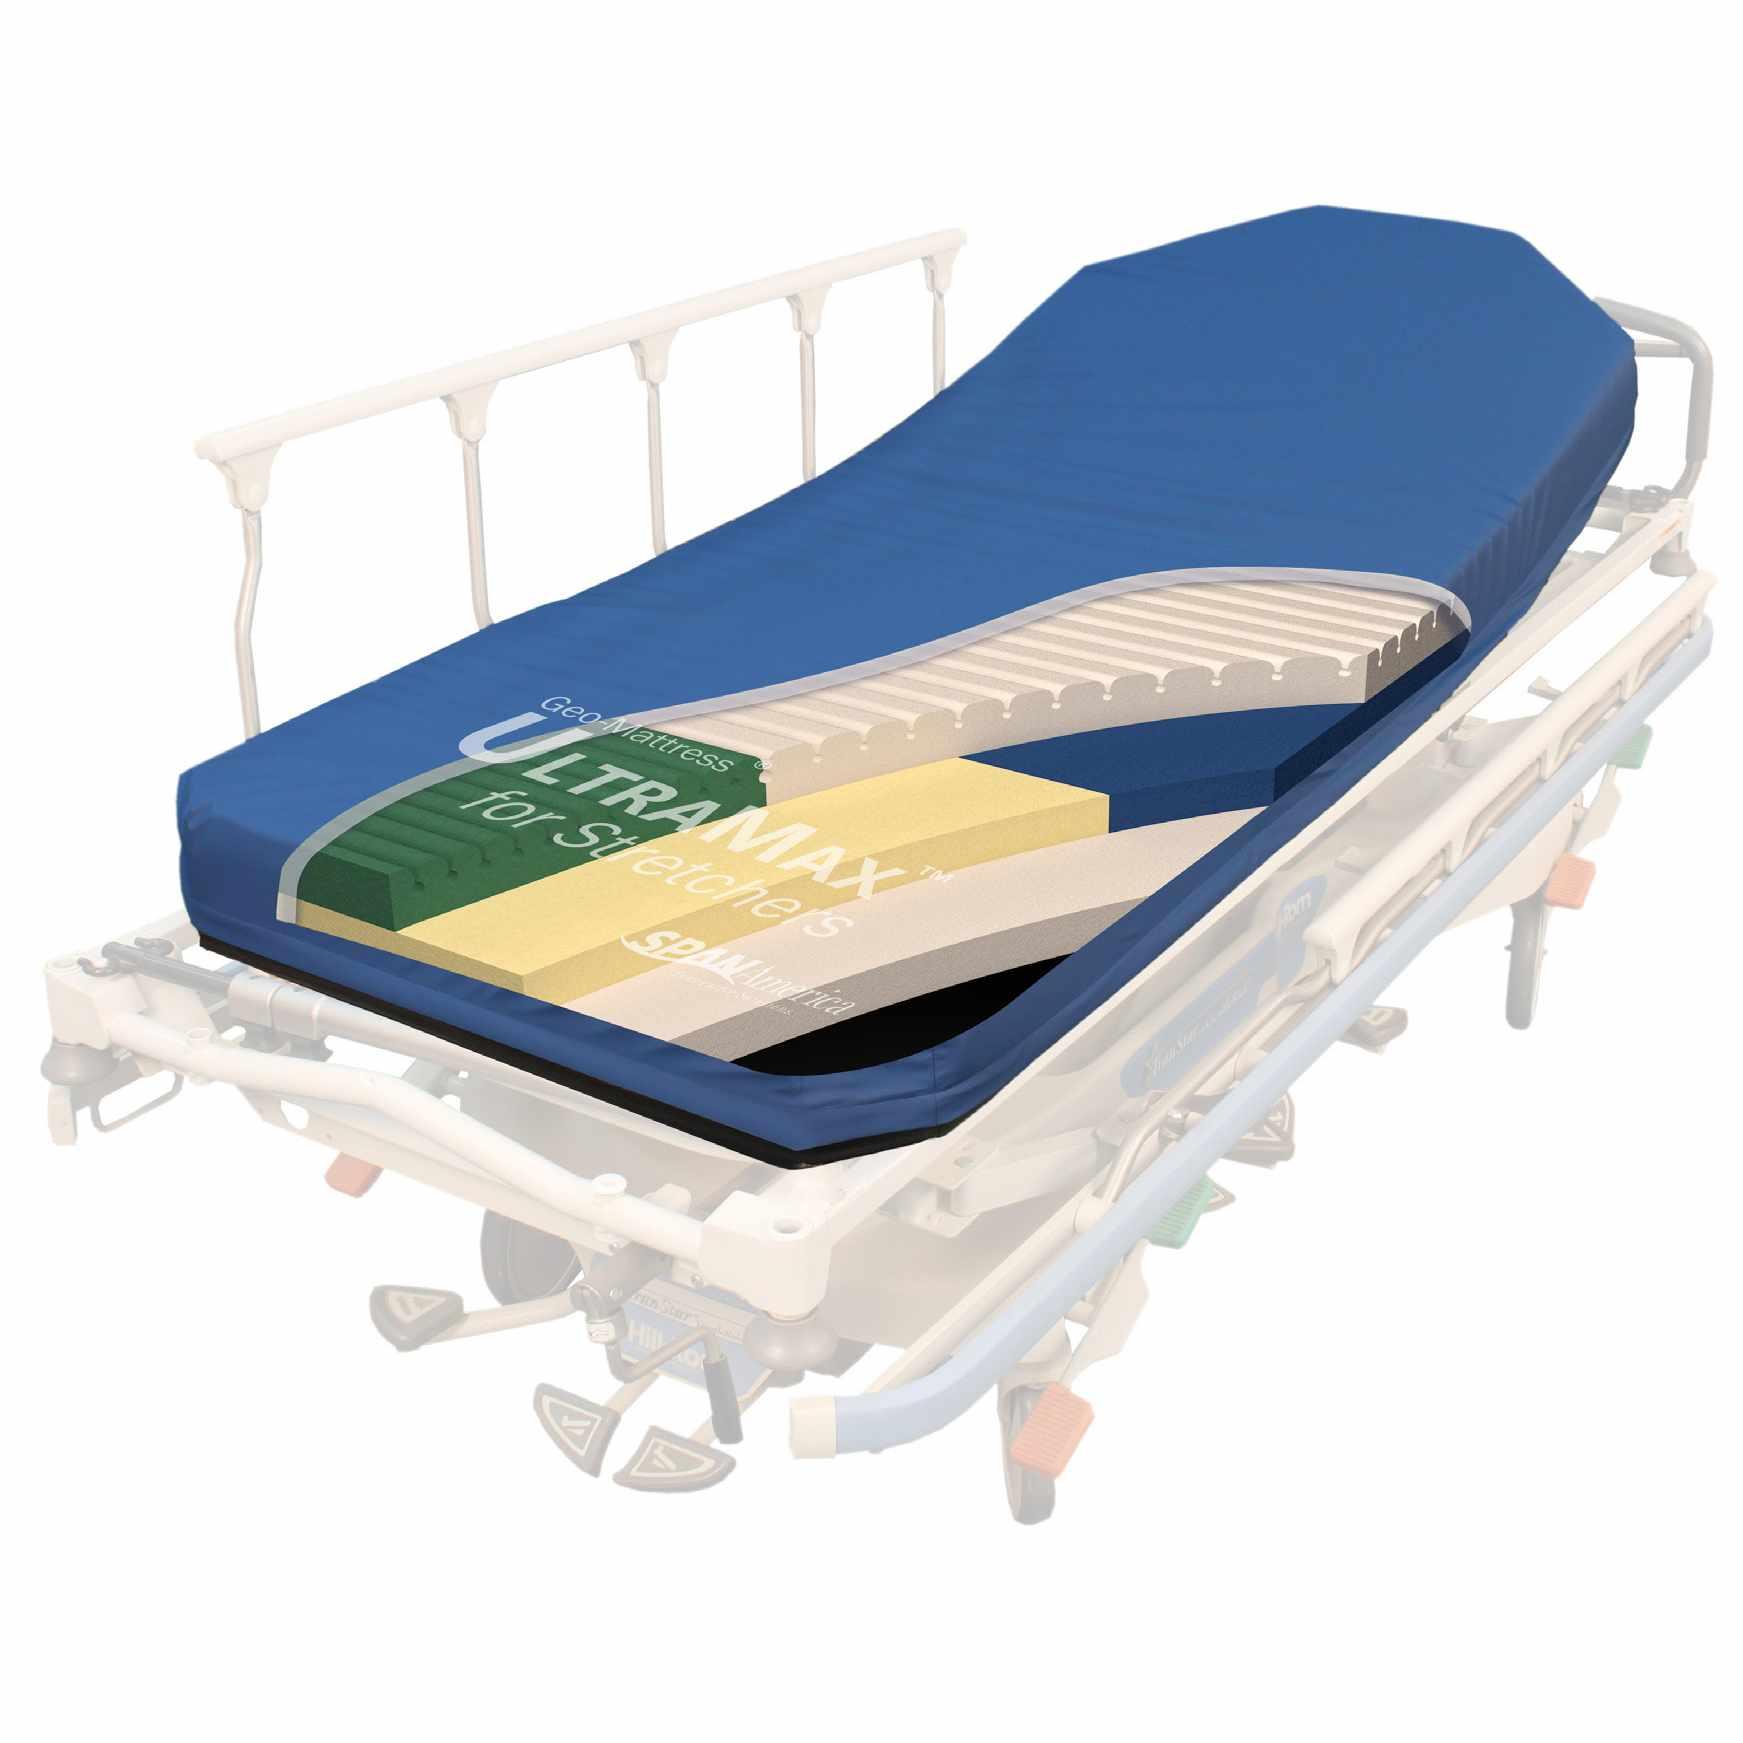 Span America Geo-Mattress UltraMax for stretchers